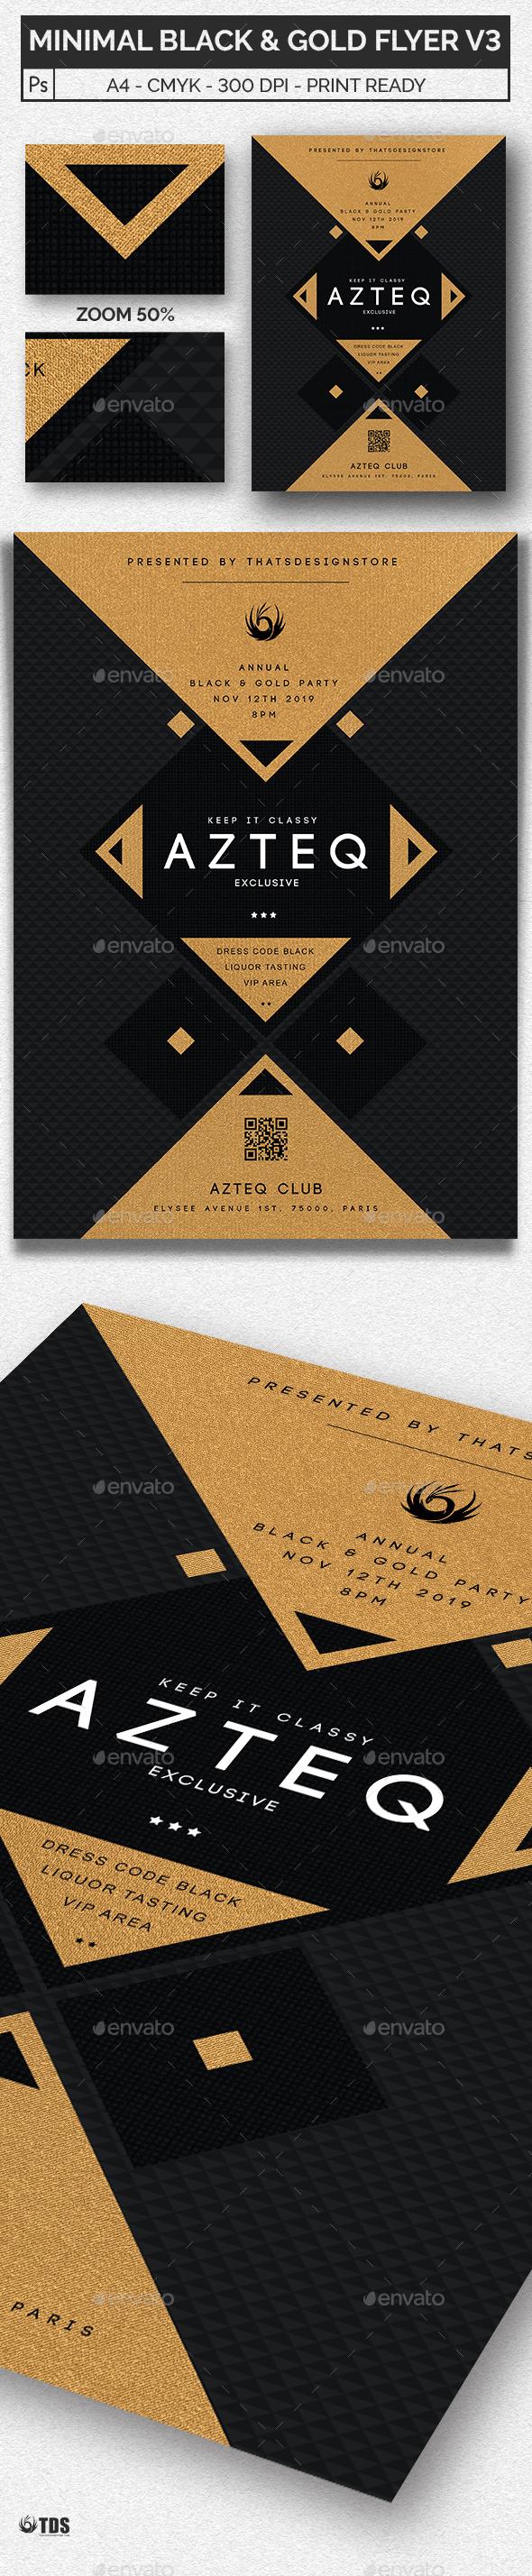 GraphicRiver Minimal Black and Gold Flyer Template V3 20437596